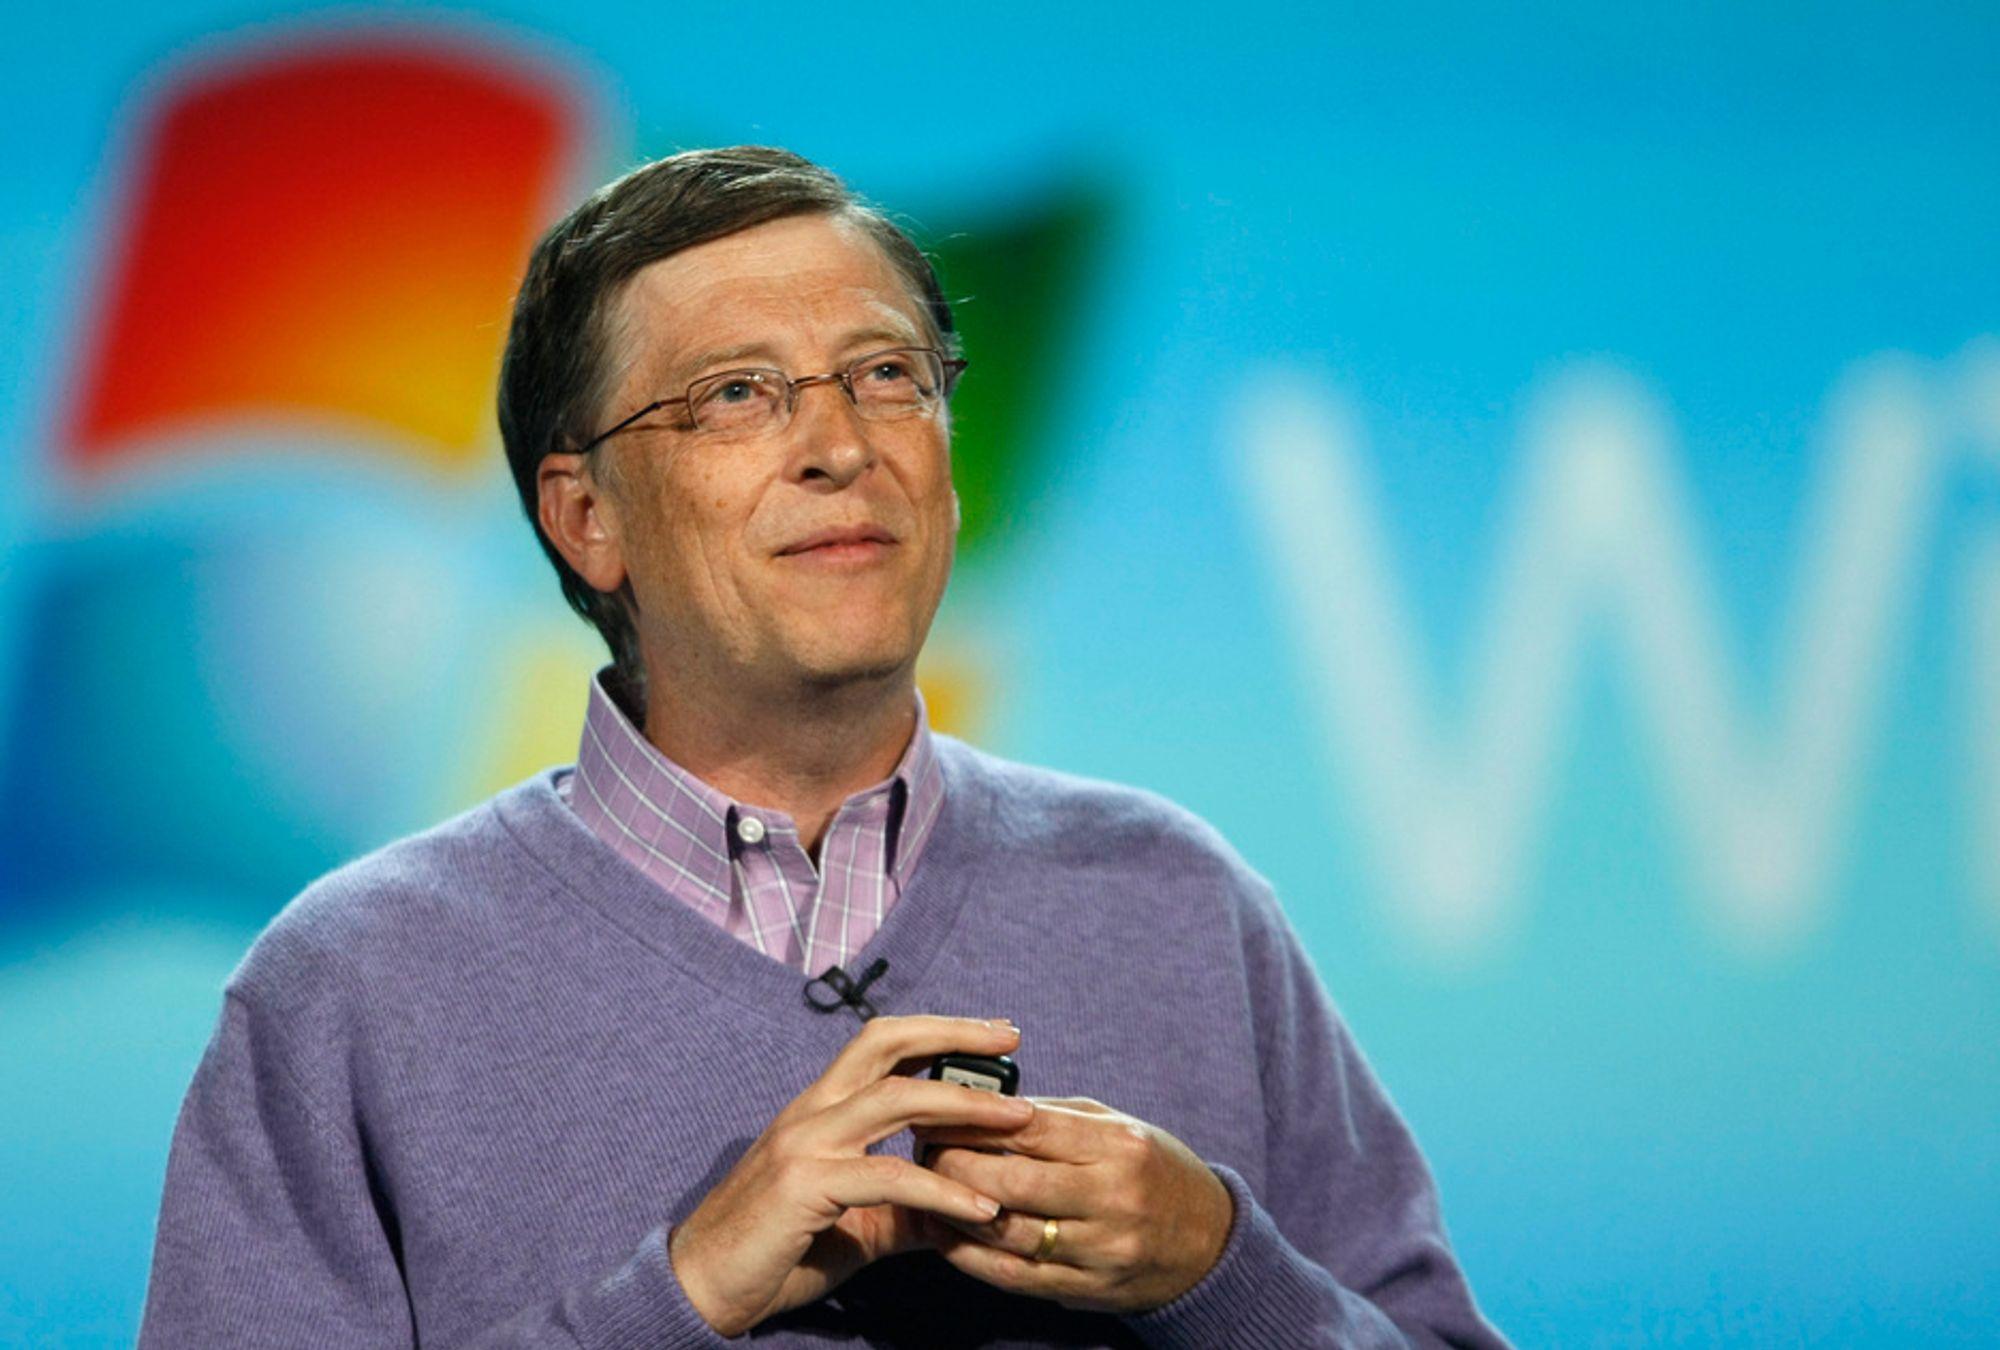 Bill Gates på CES 2008 i Las Vegas.